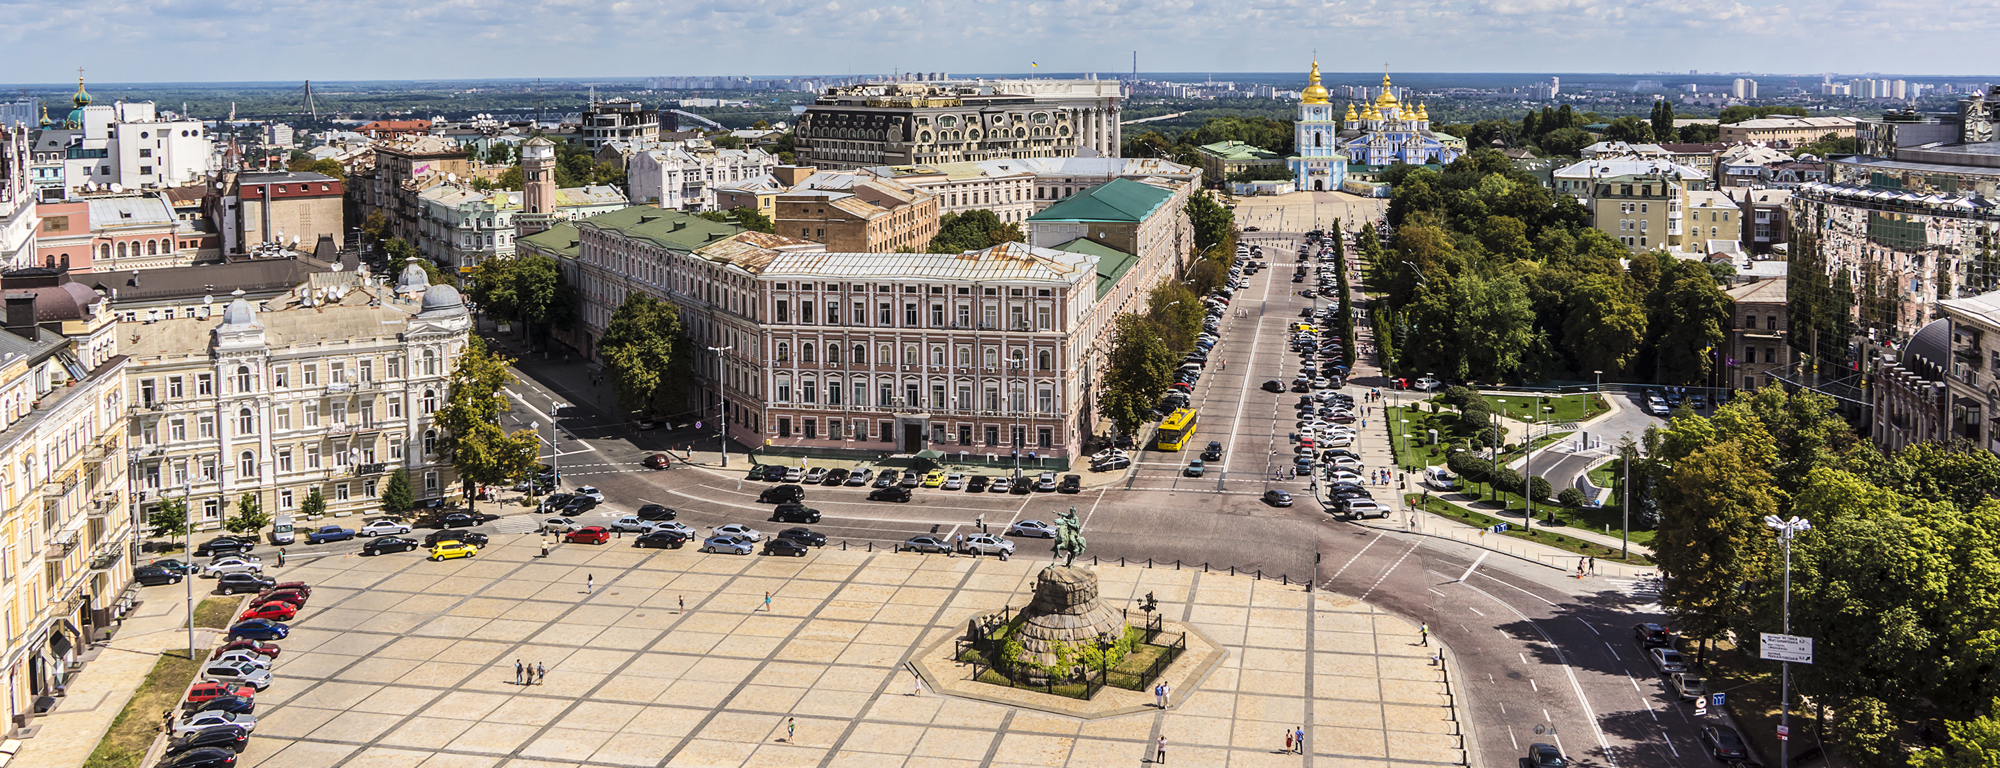 Why Ukrainian Tech Companies Face Raids by Masked Police